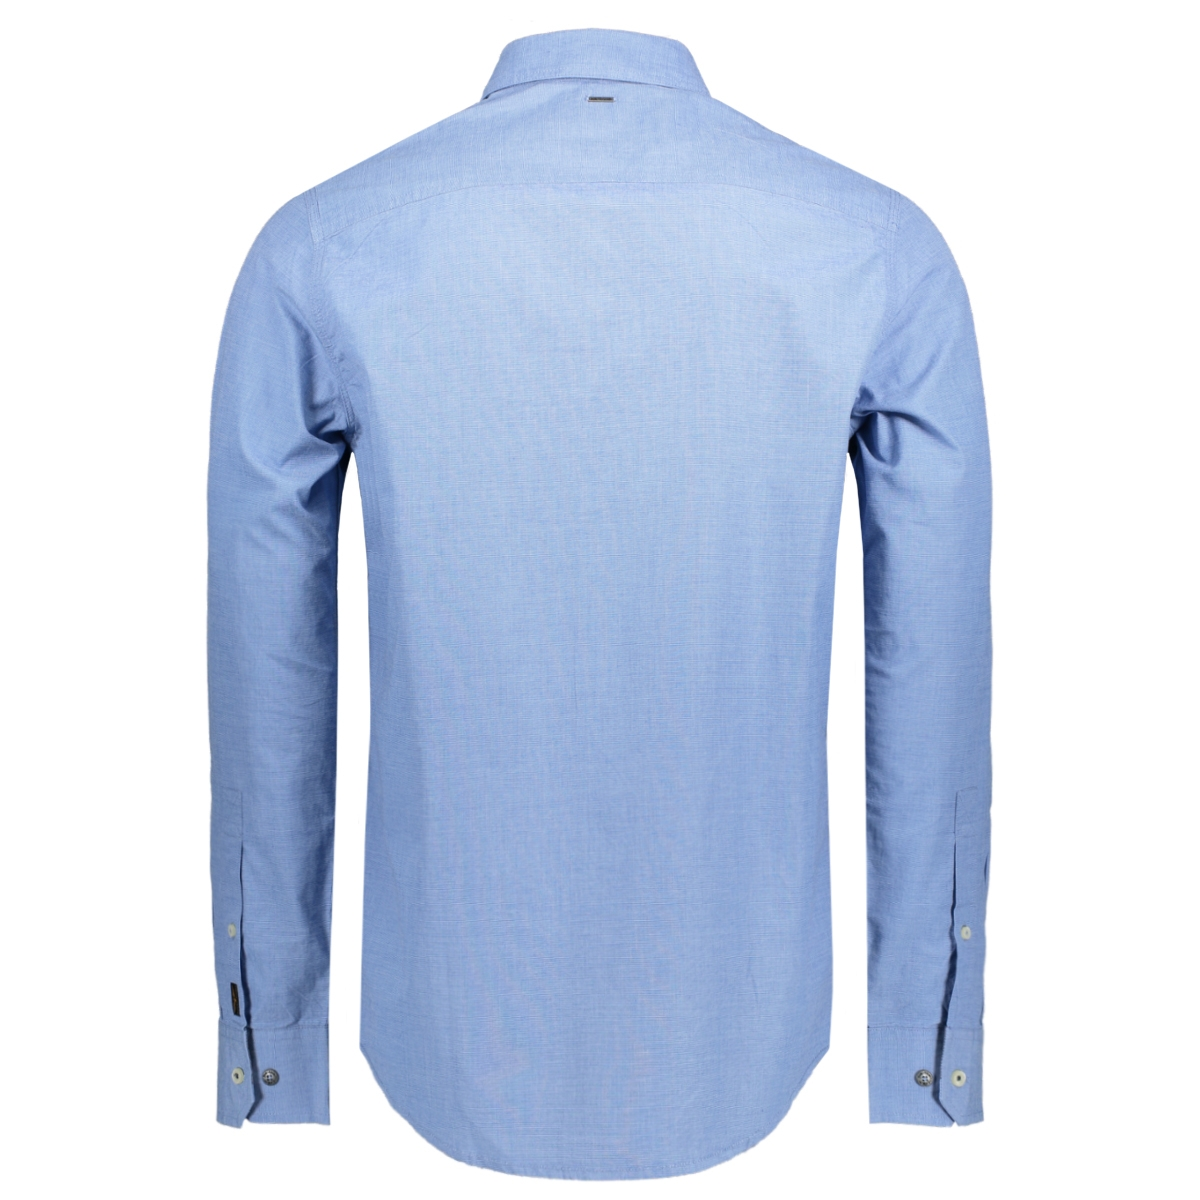 psi00292 pme legend overhemd 547